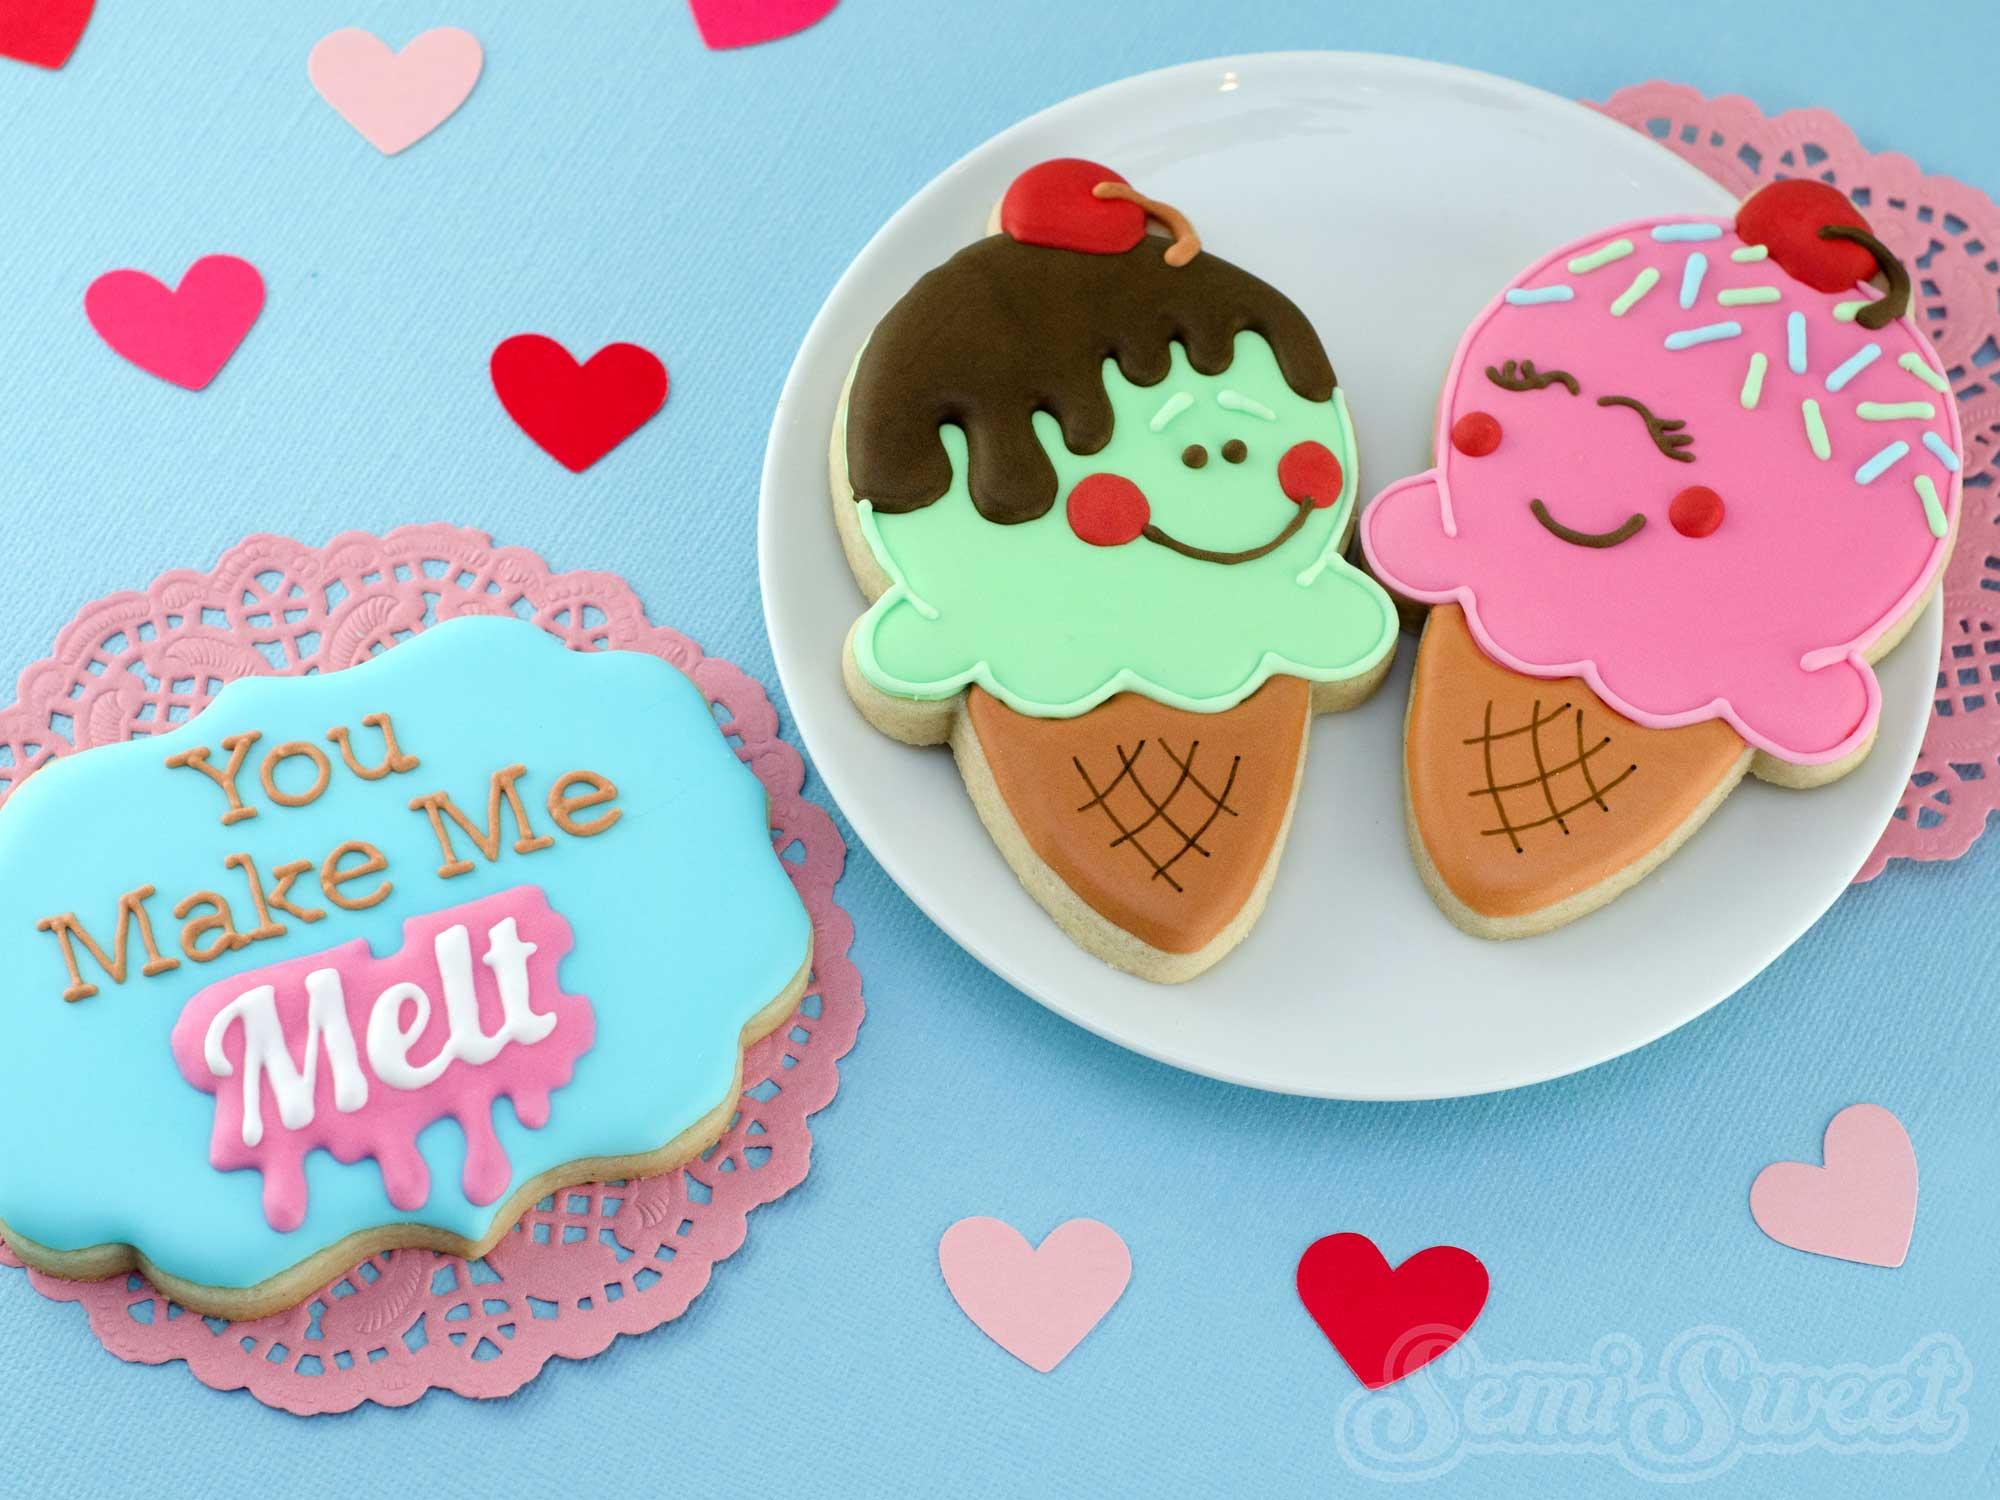 How to Make Cute Ice Cream Cone Cookies